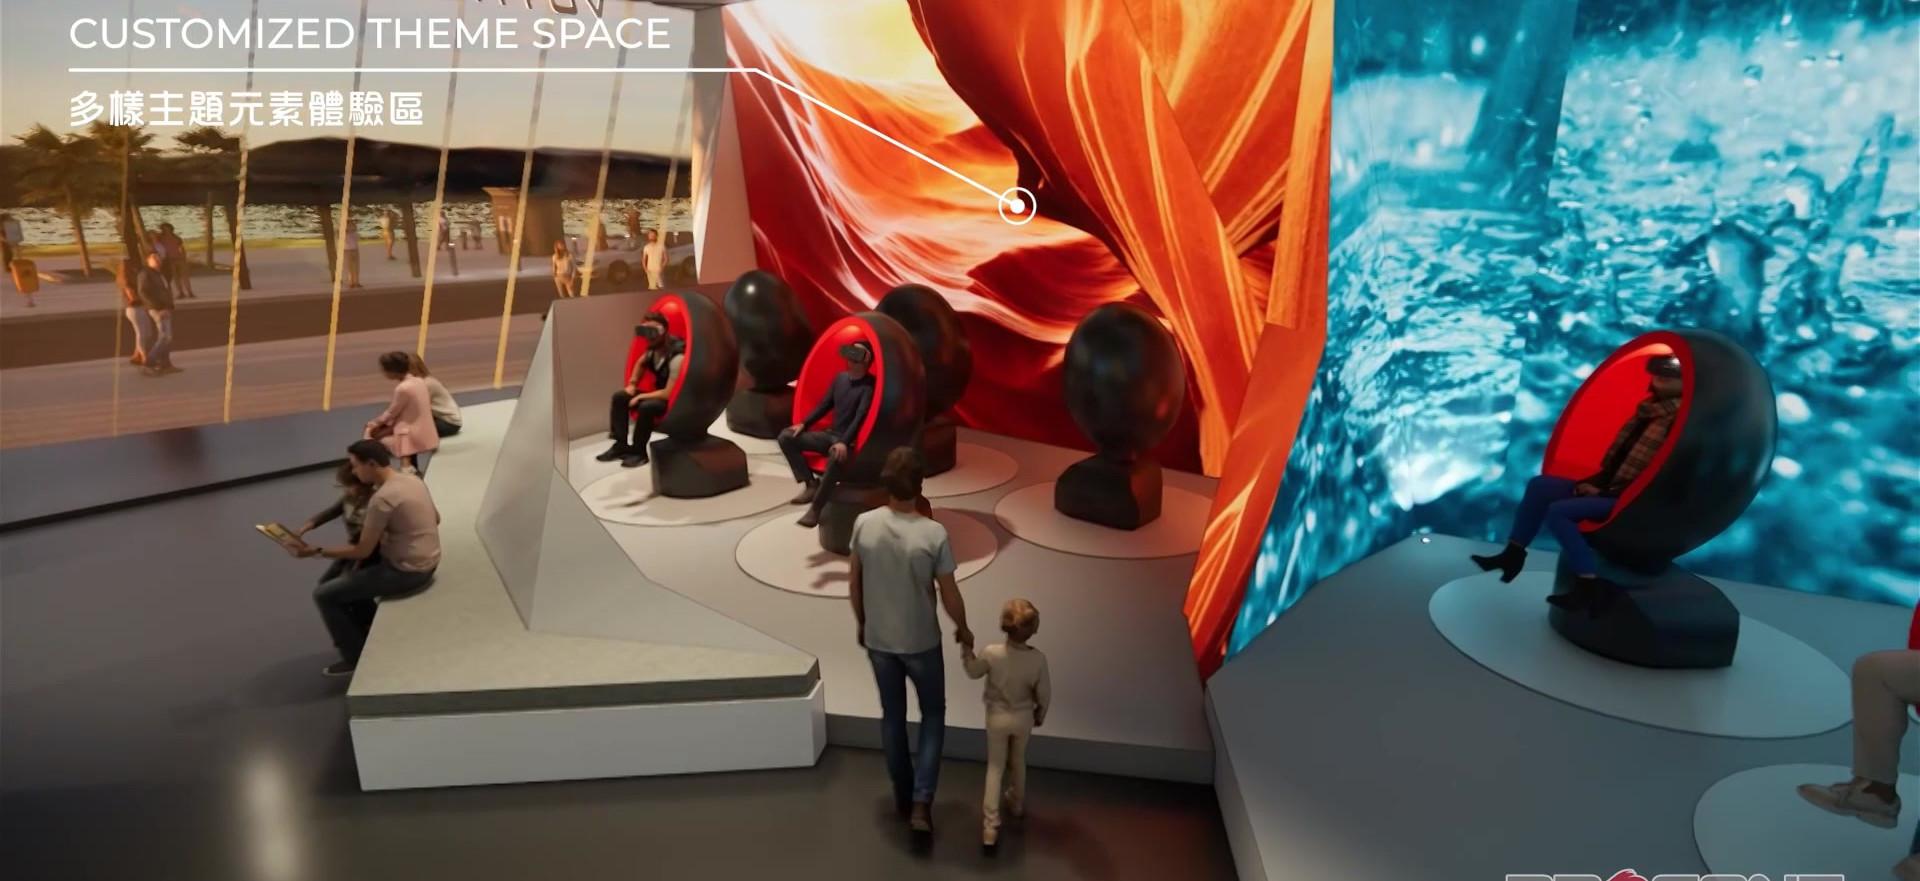 Voyager Ride Concept - M - 30 Seats Option